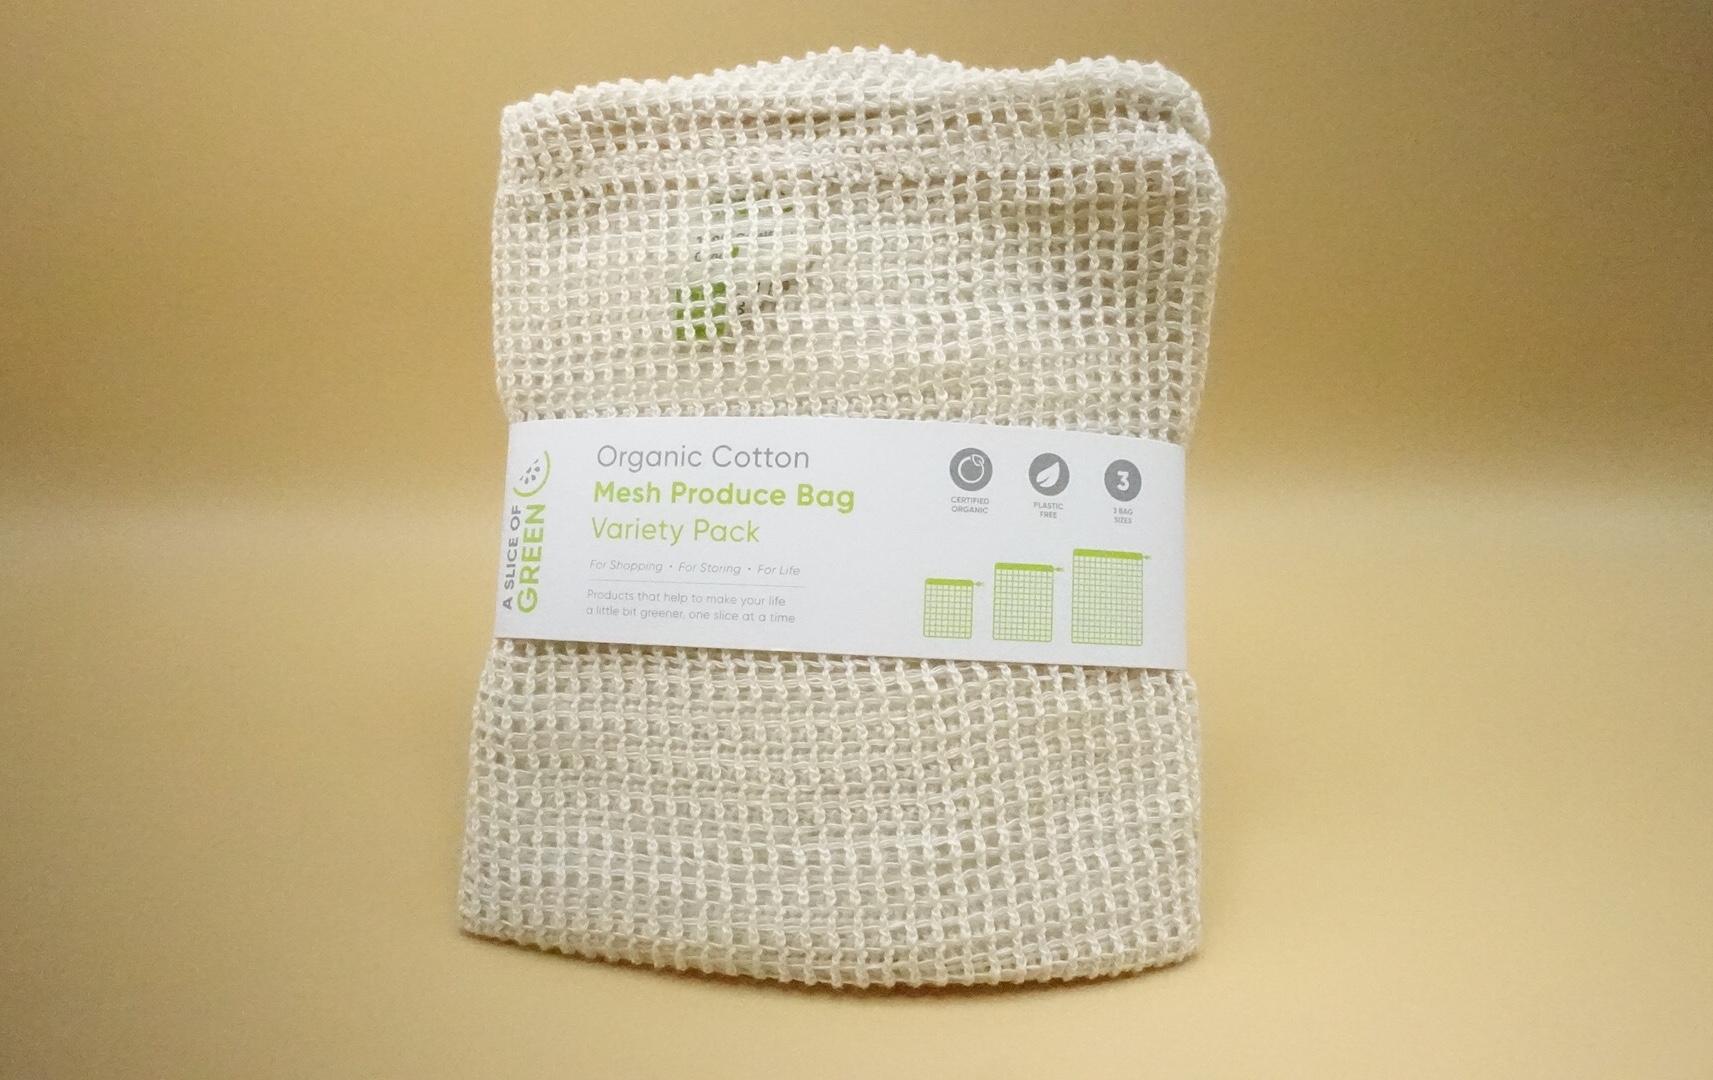 Mesh produce bags 3 pack